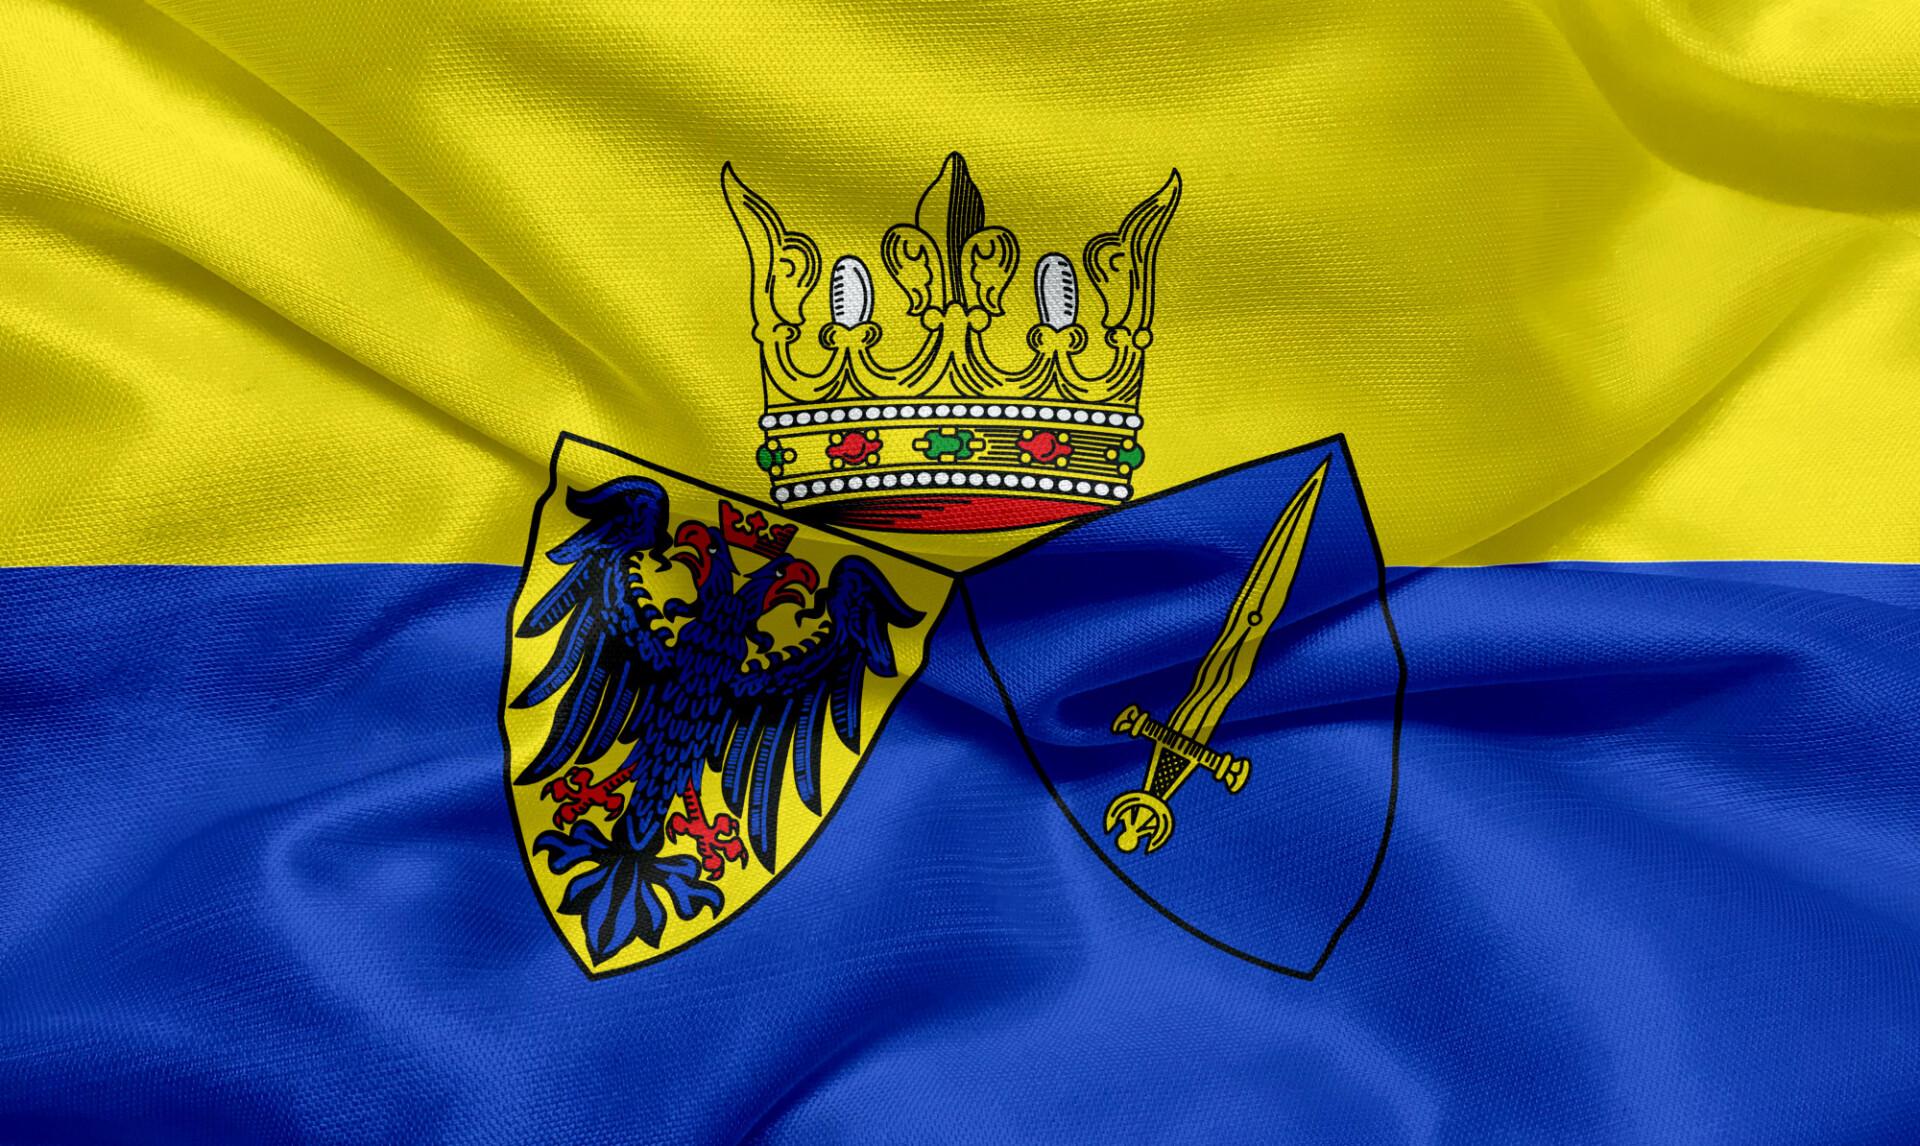 Flag of the city of Essen